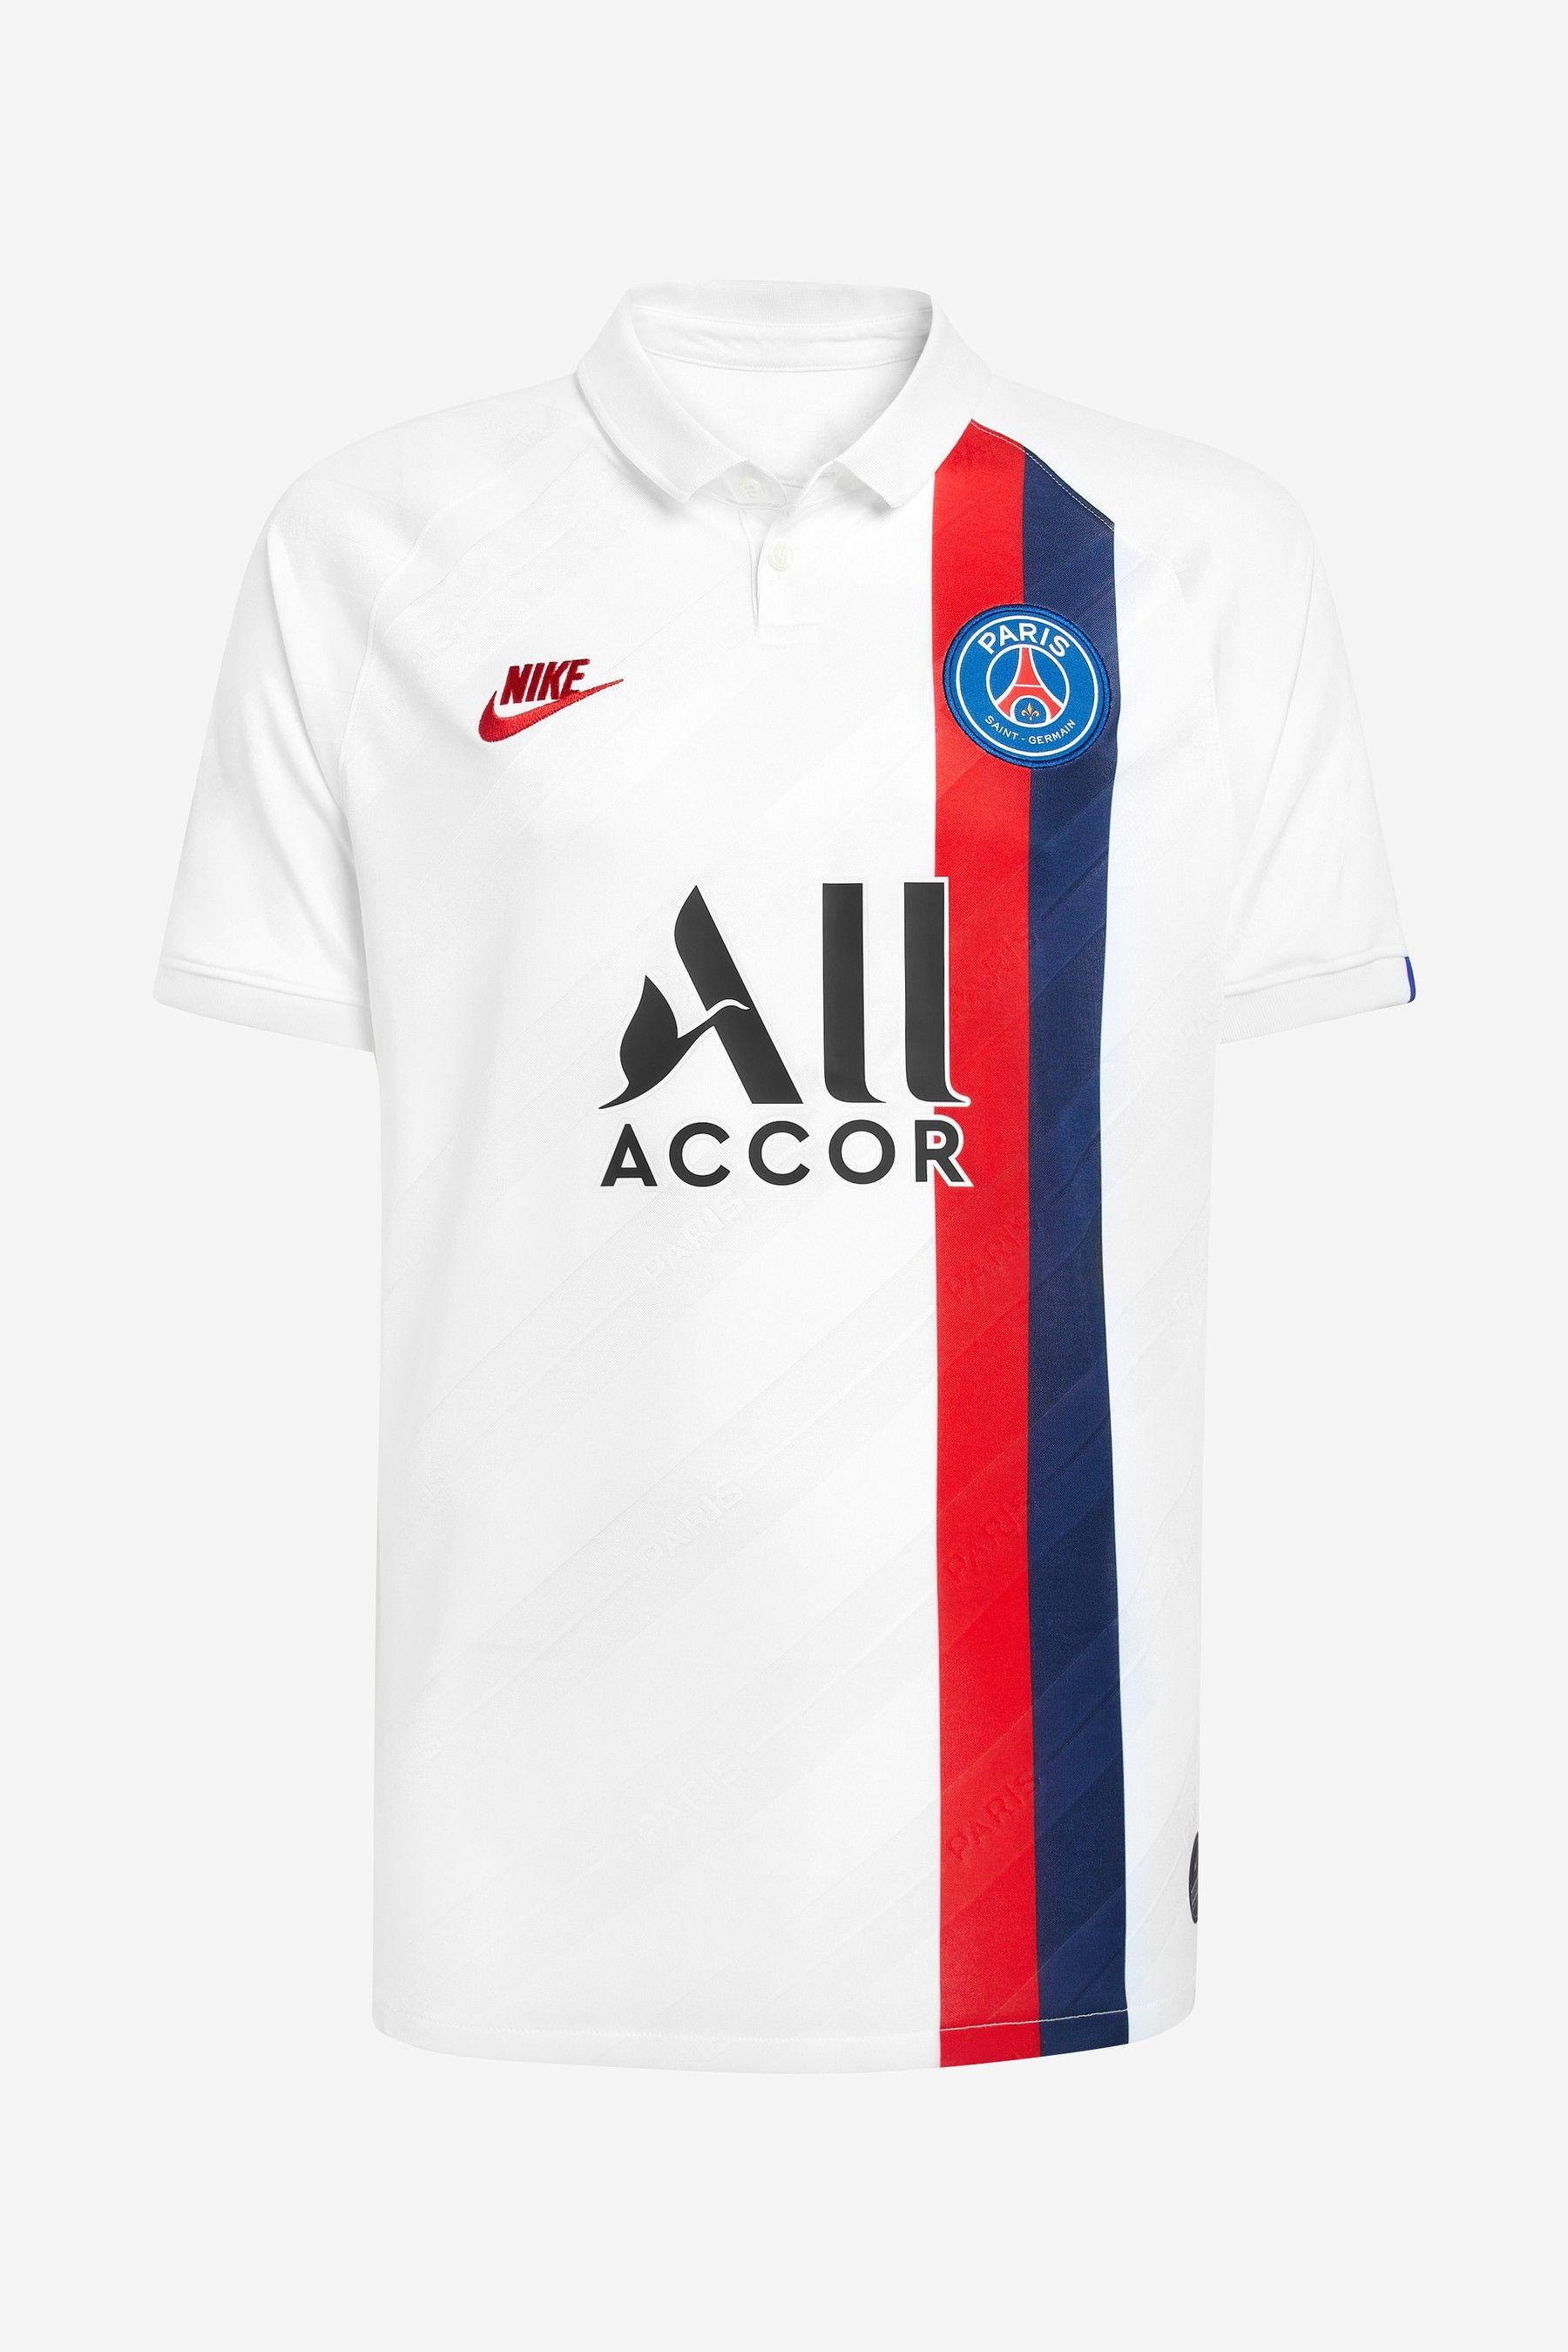 Nike White PSG 2019/20 Jersey Top imagens) Camisas